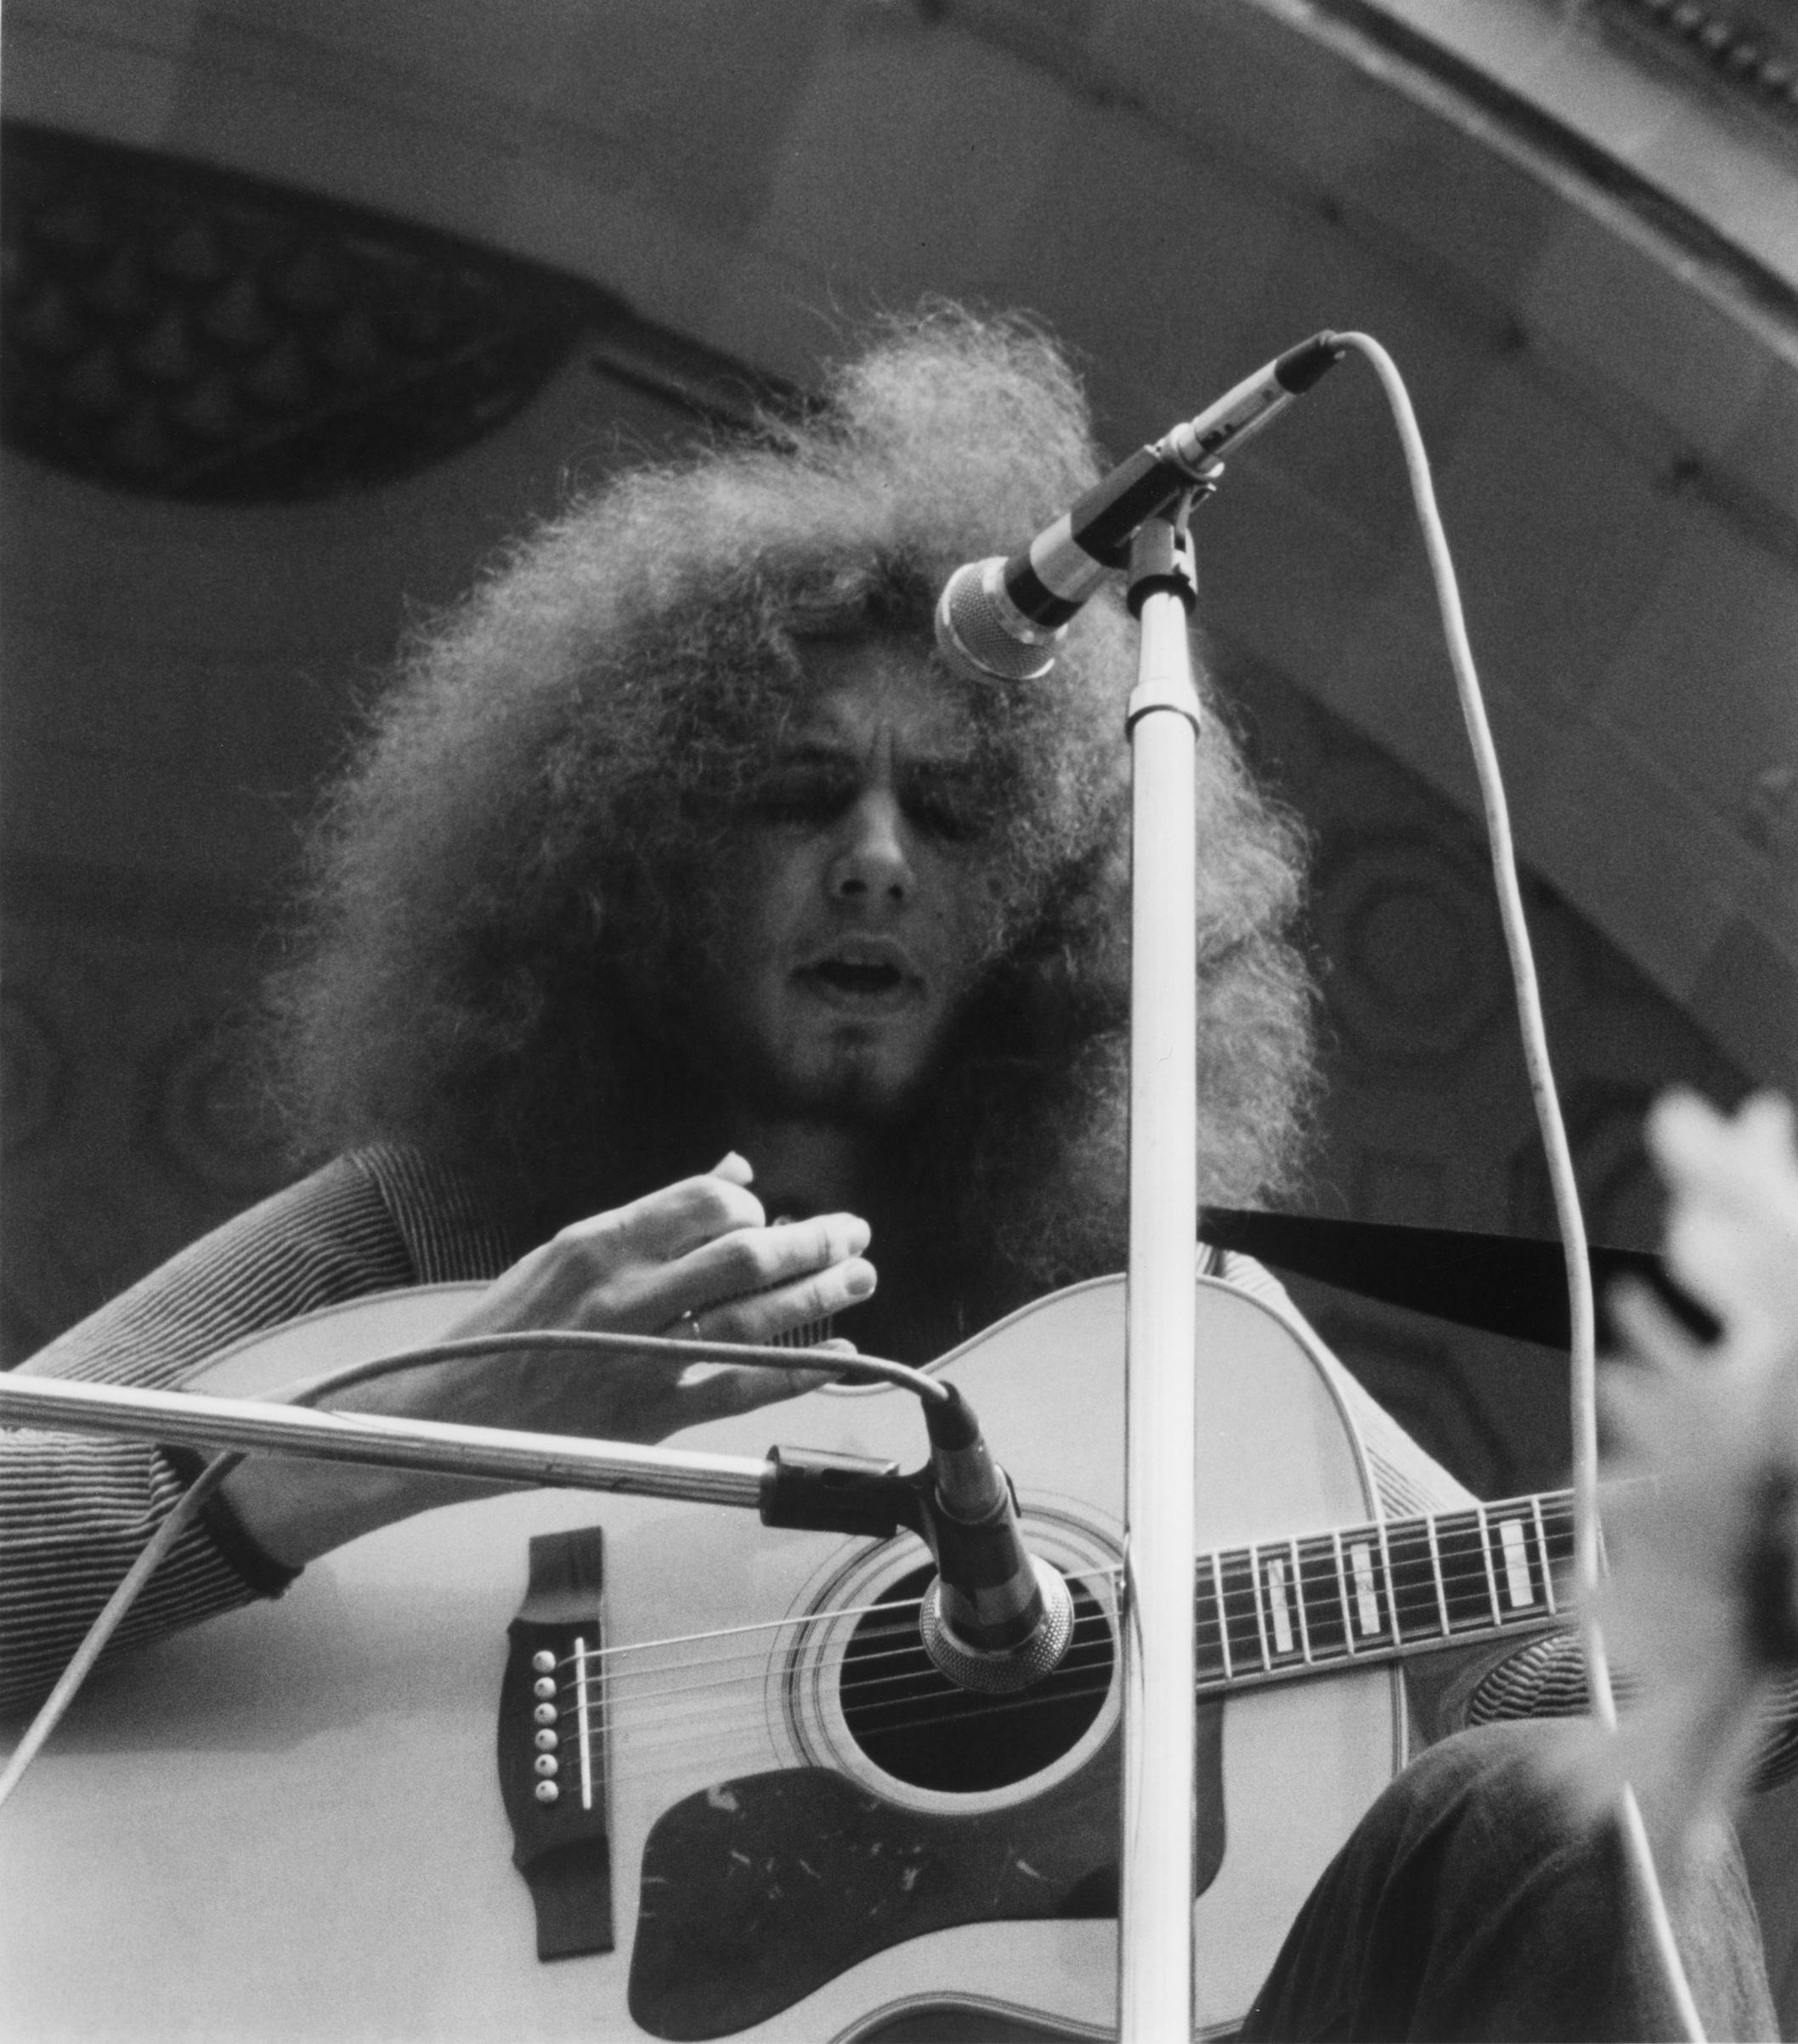 Musician Bert Sommer performs onstage in 1969.